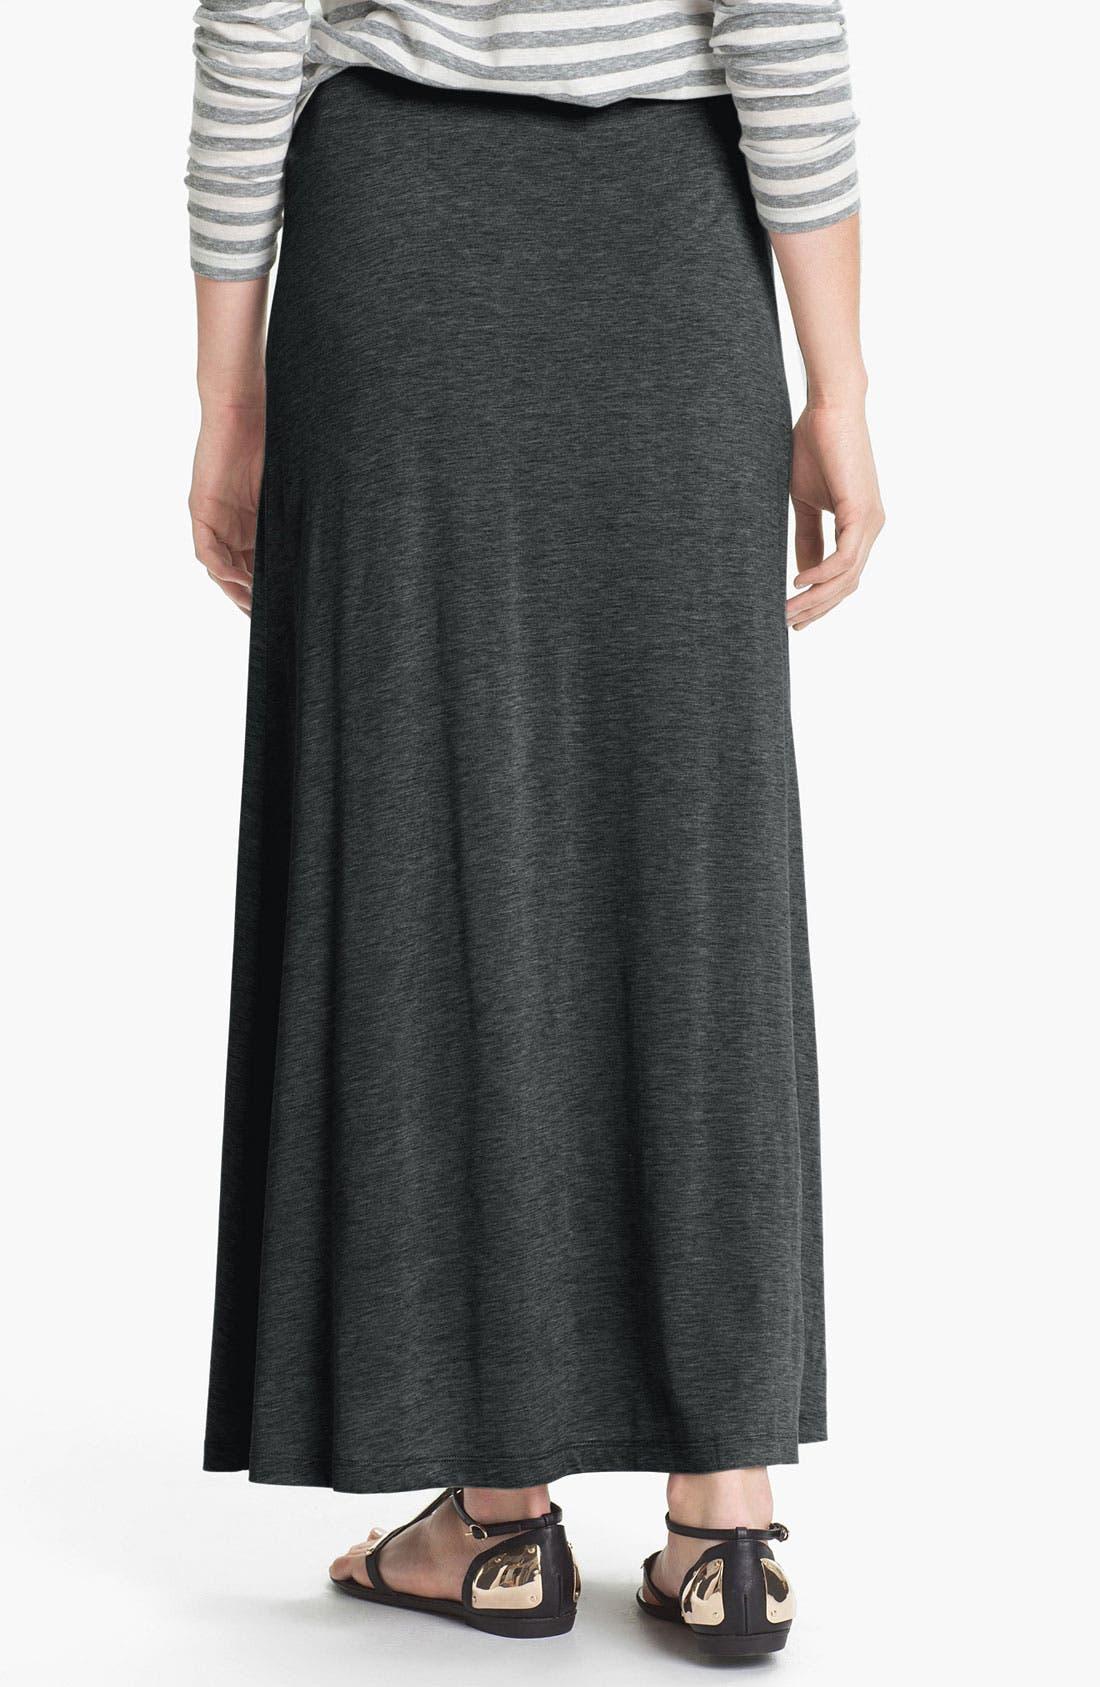 EILEEN FISHER,                             Silk & Cotton Jersey Maxi Skirt,                             Alternate thumbnail 3, color,                             025